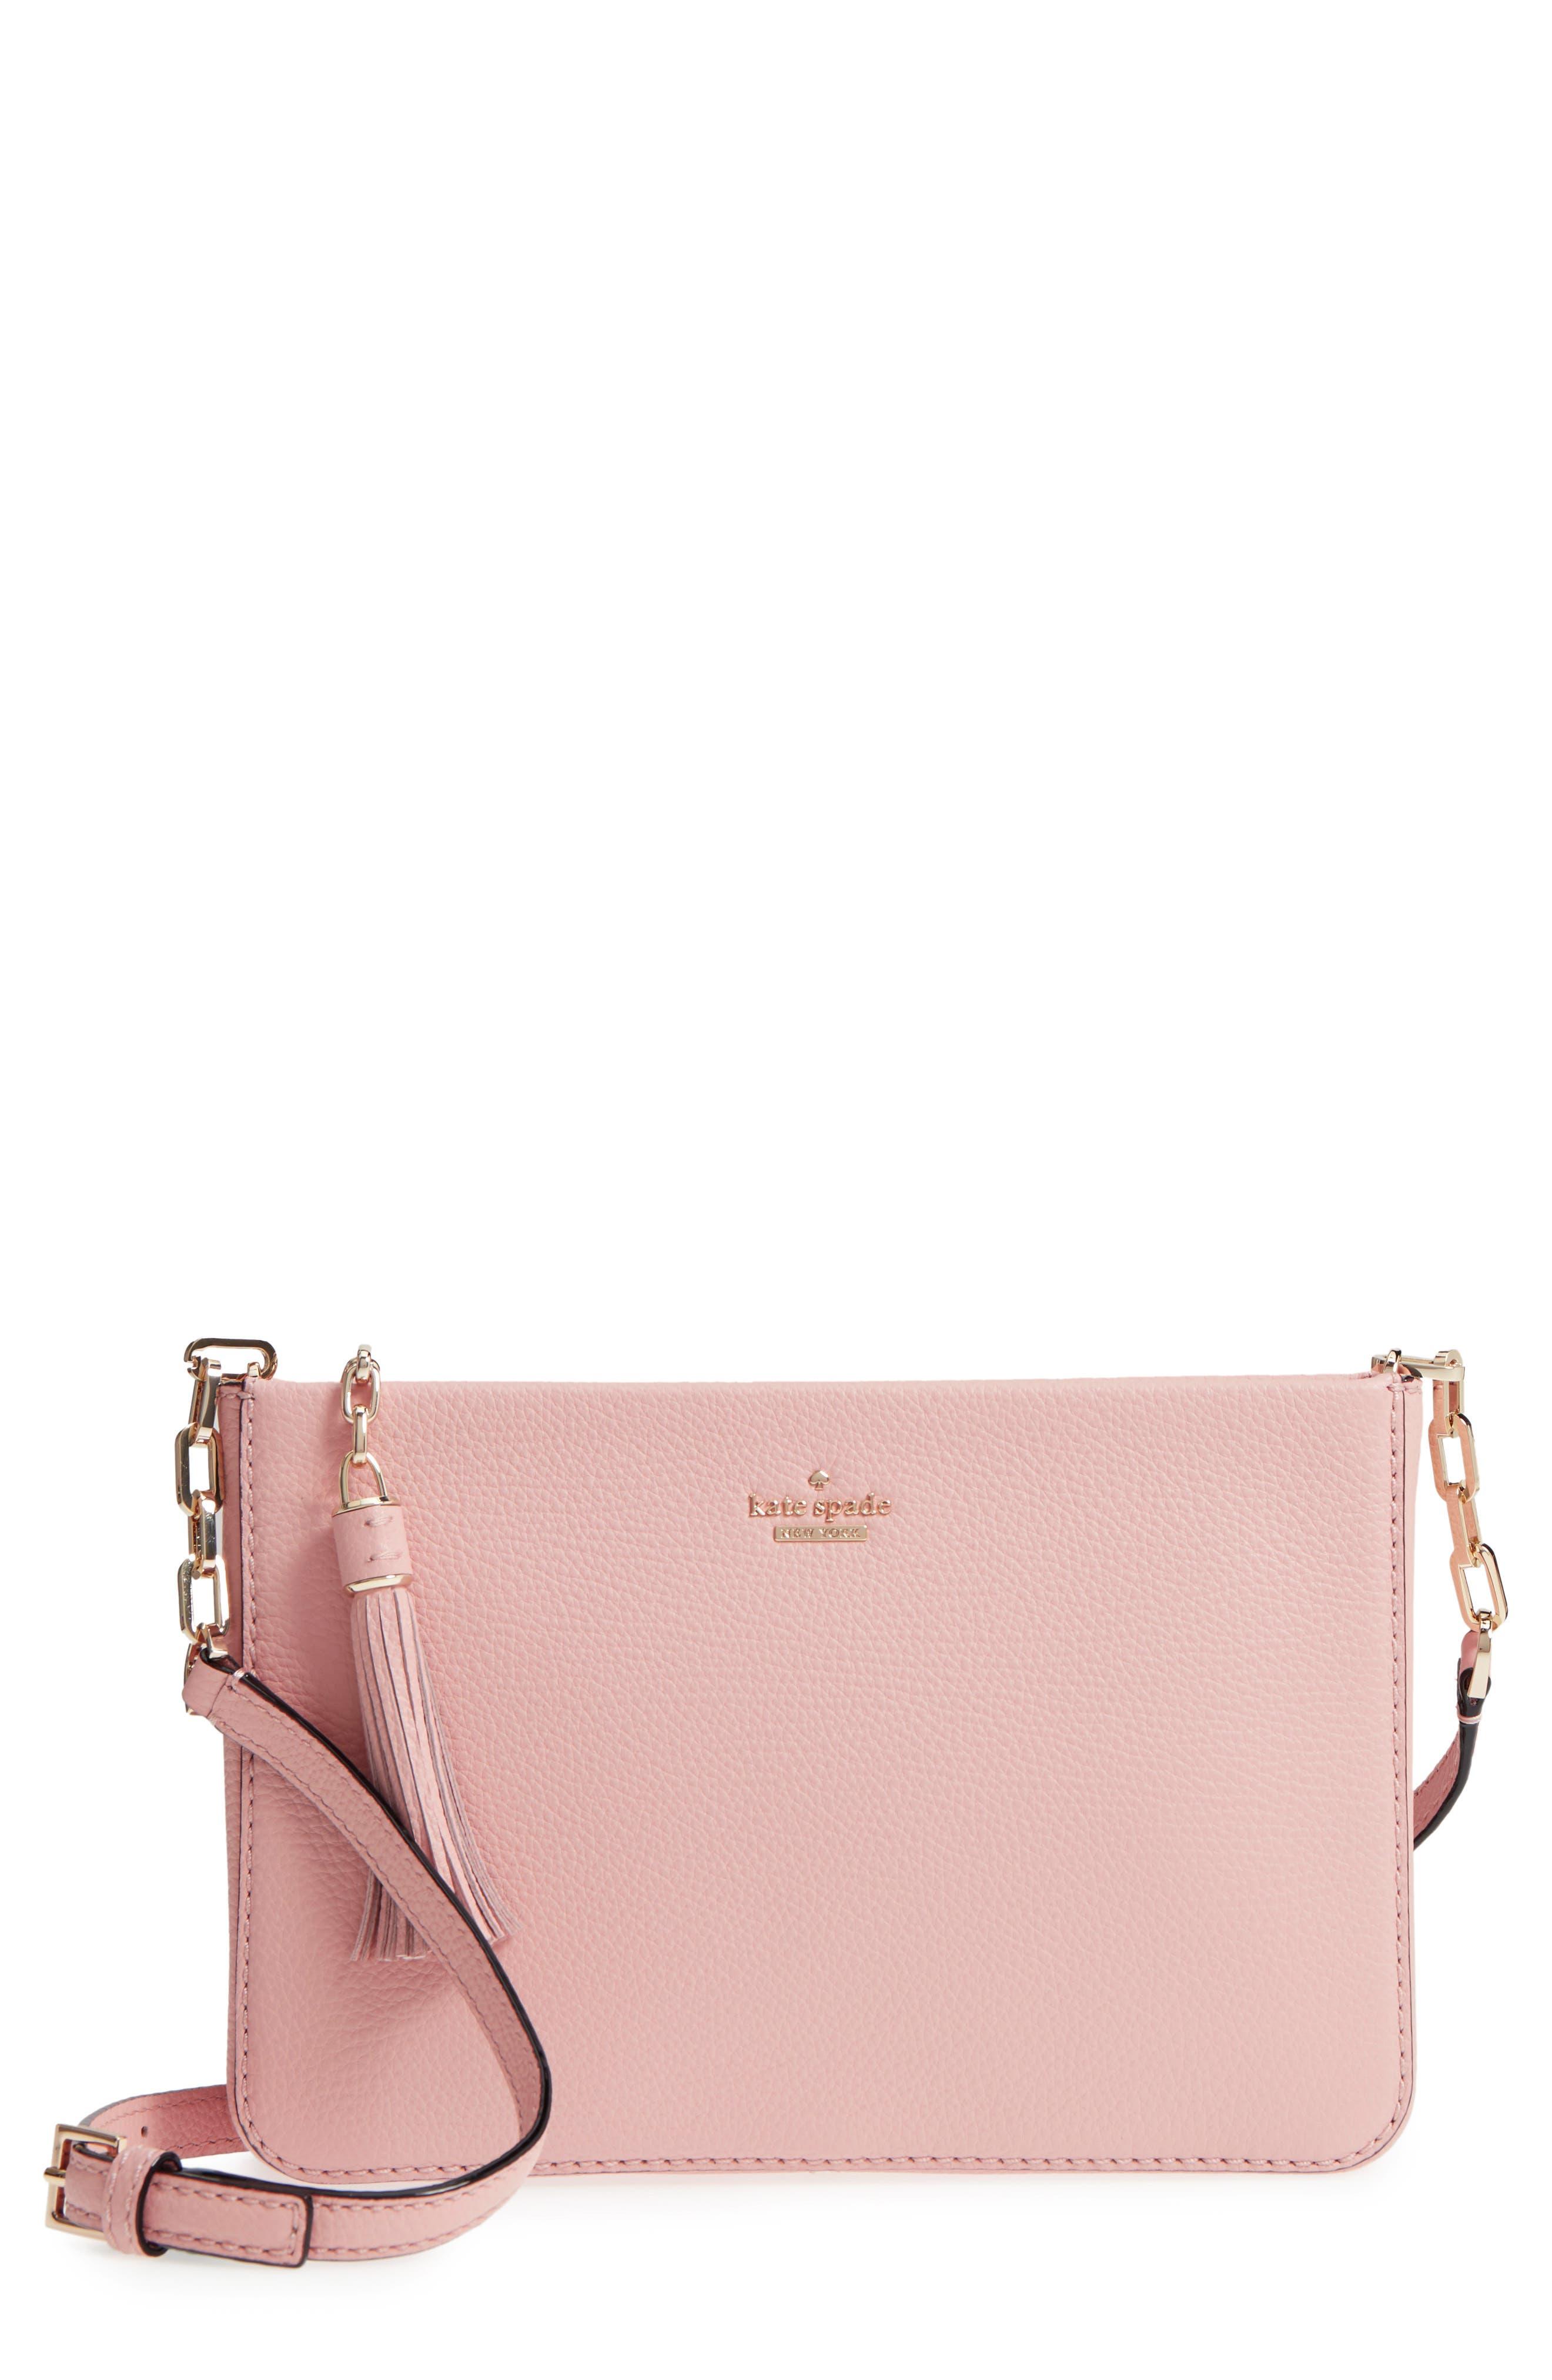 kingston drive - alessa leather shoulder/crossbody bag,                             Main thumbnail 1, color,                             Warm Vellum